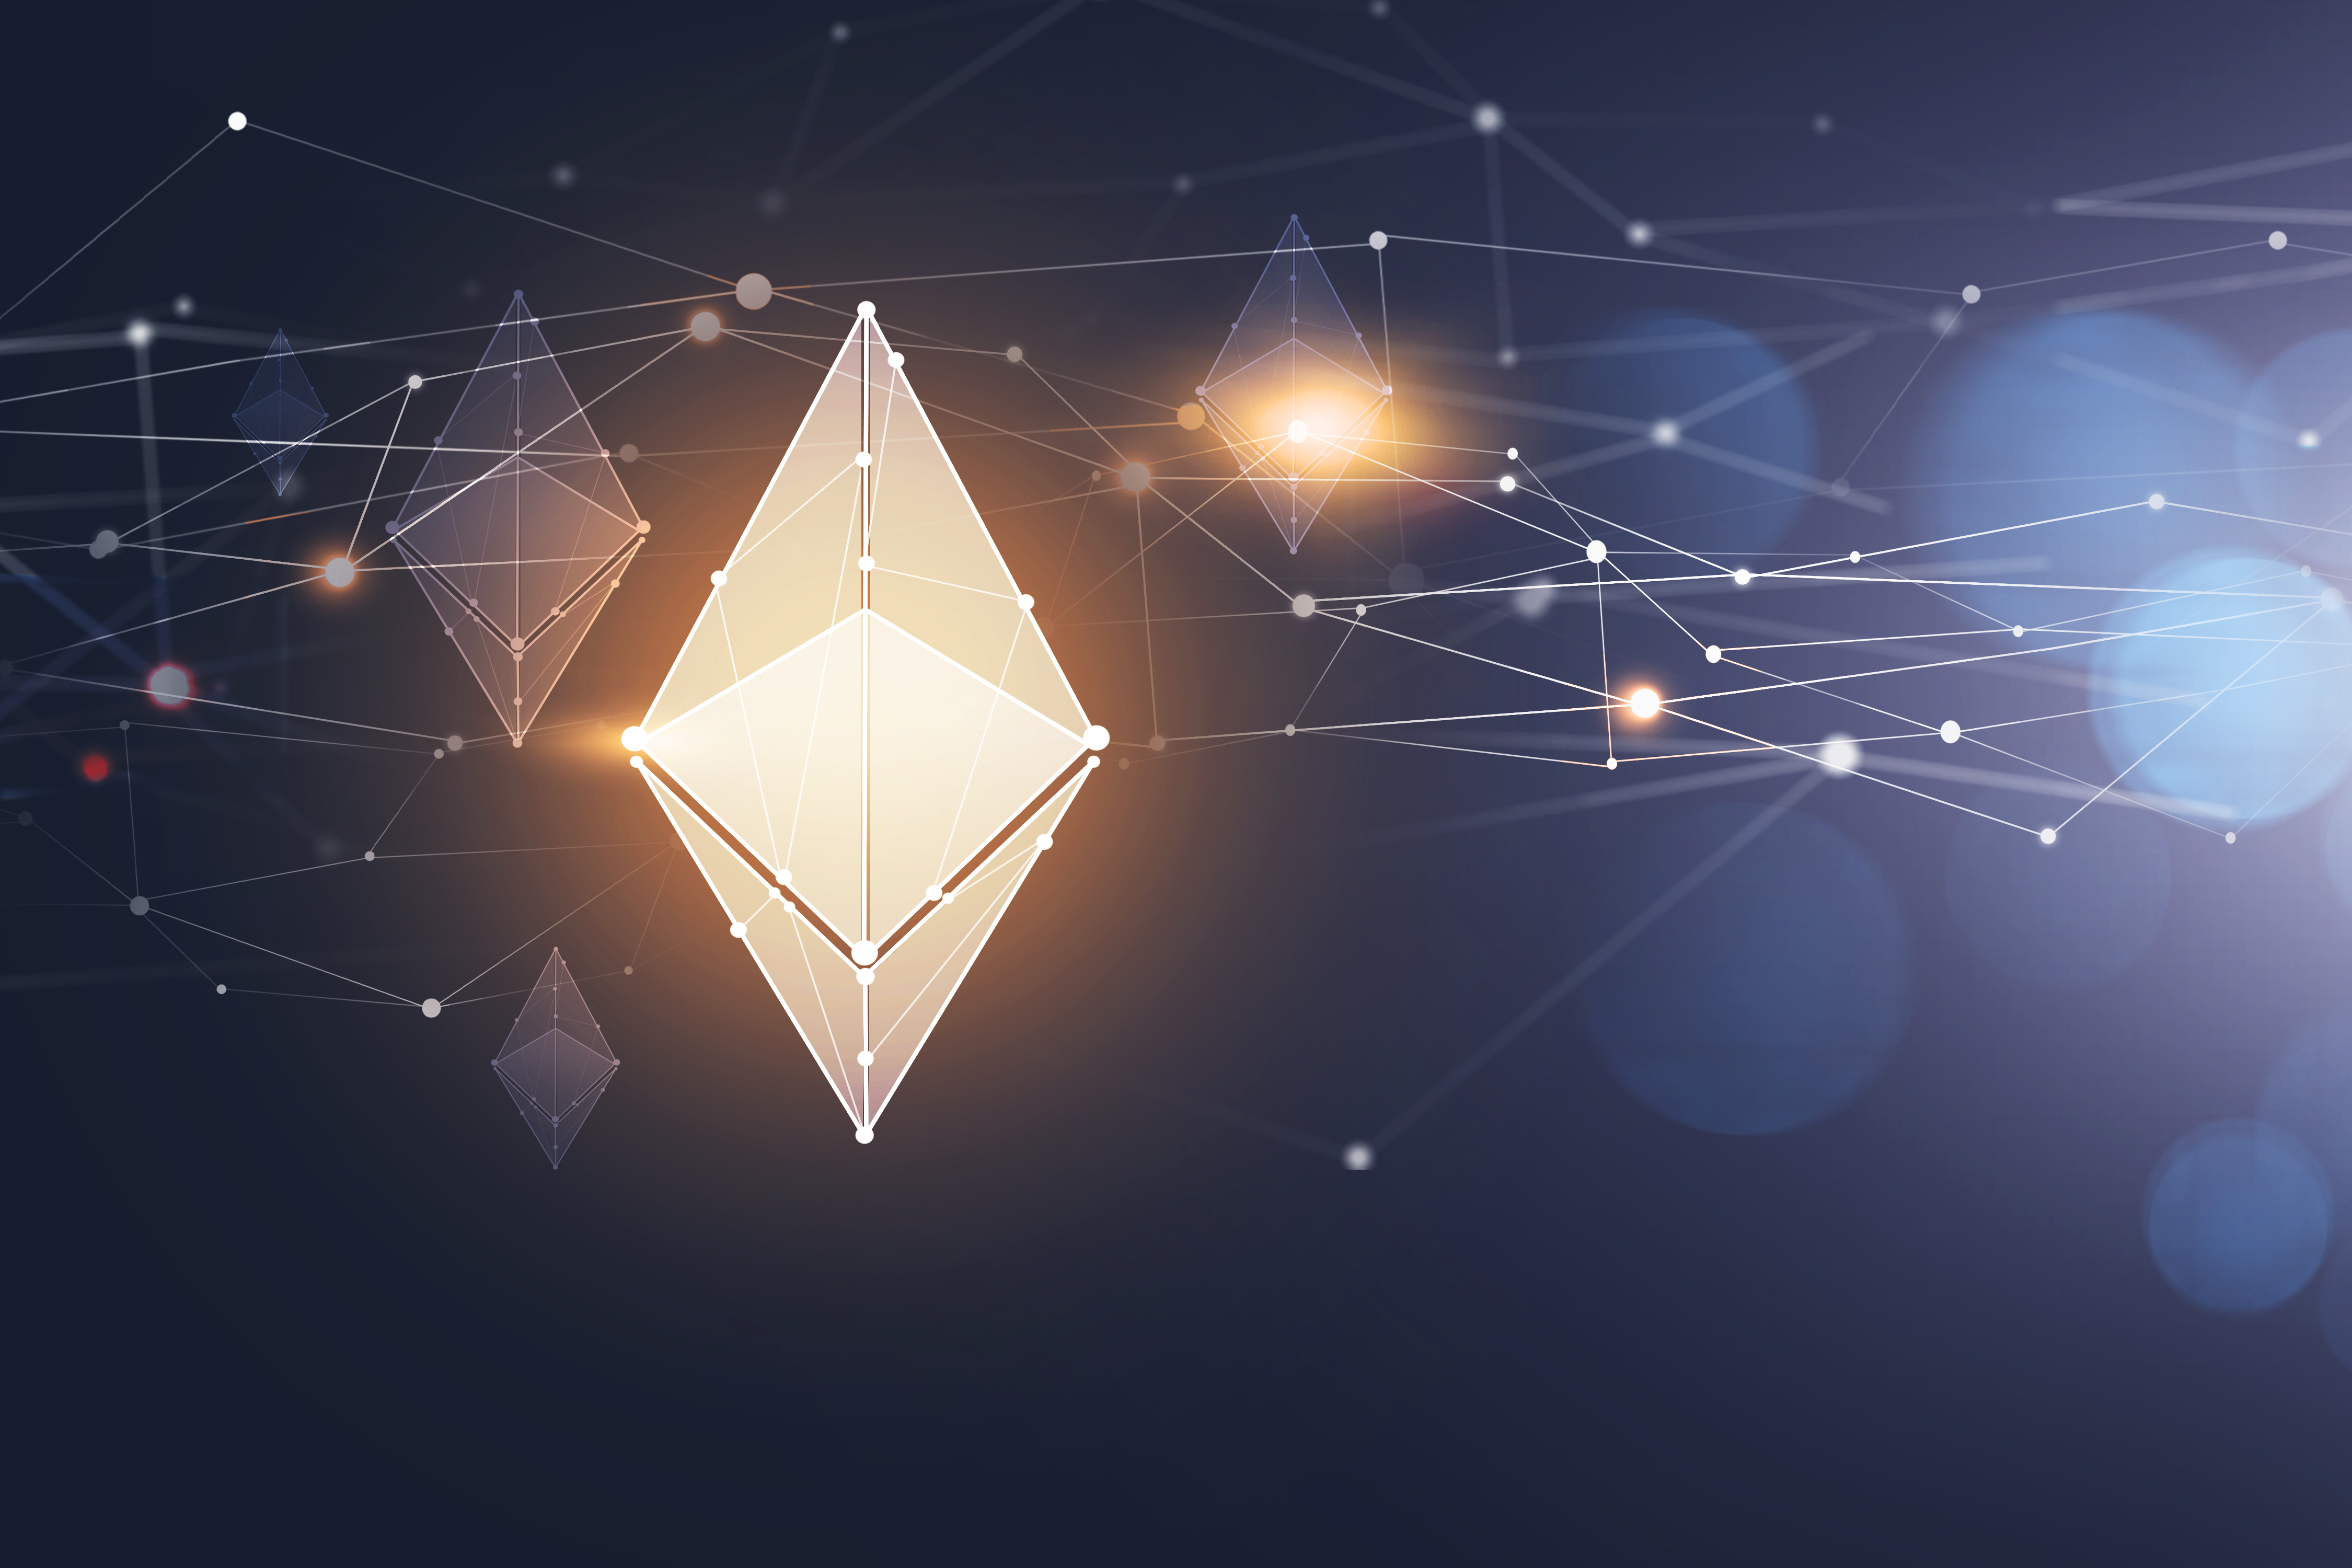 Ethereum 2.0: Vitalik Buterin Says London Hard Fork Makes Him More Confident About Merge